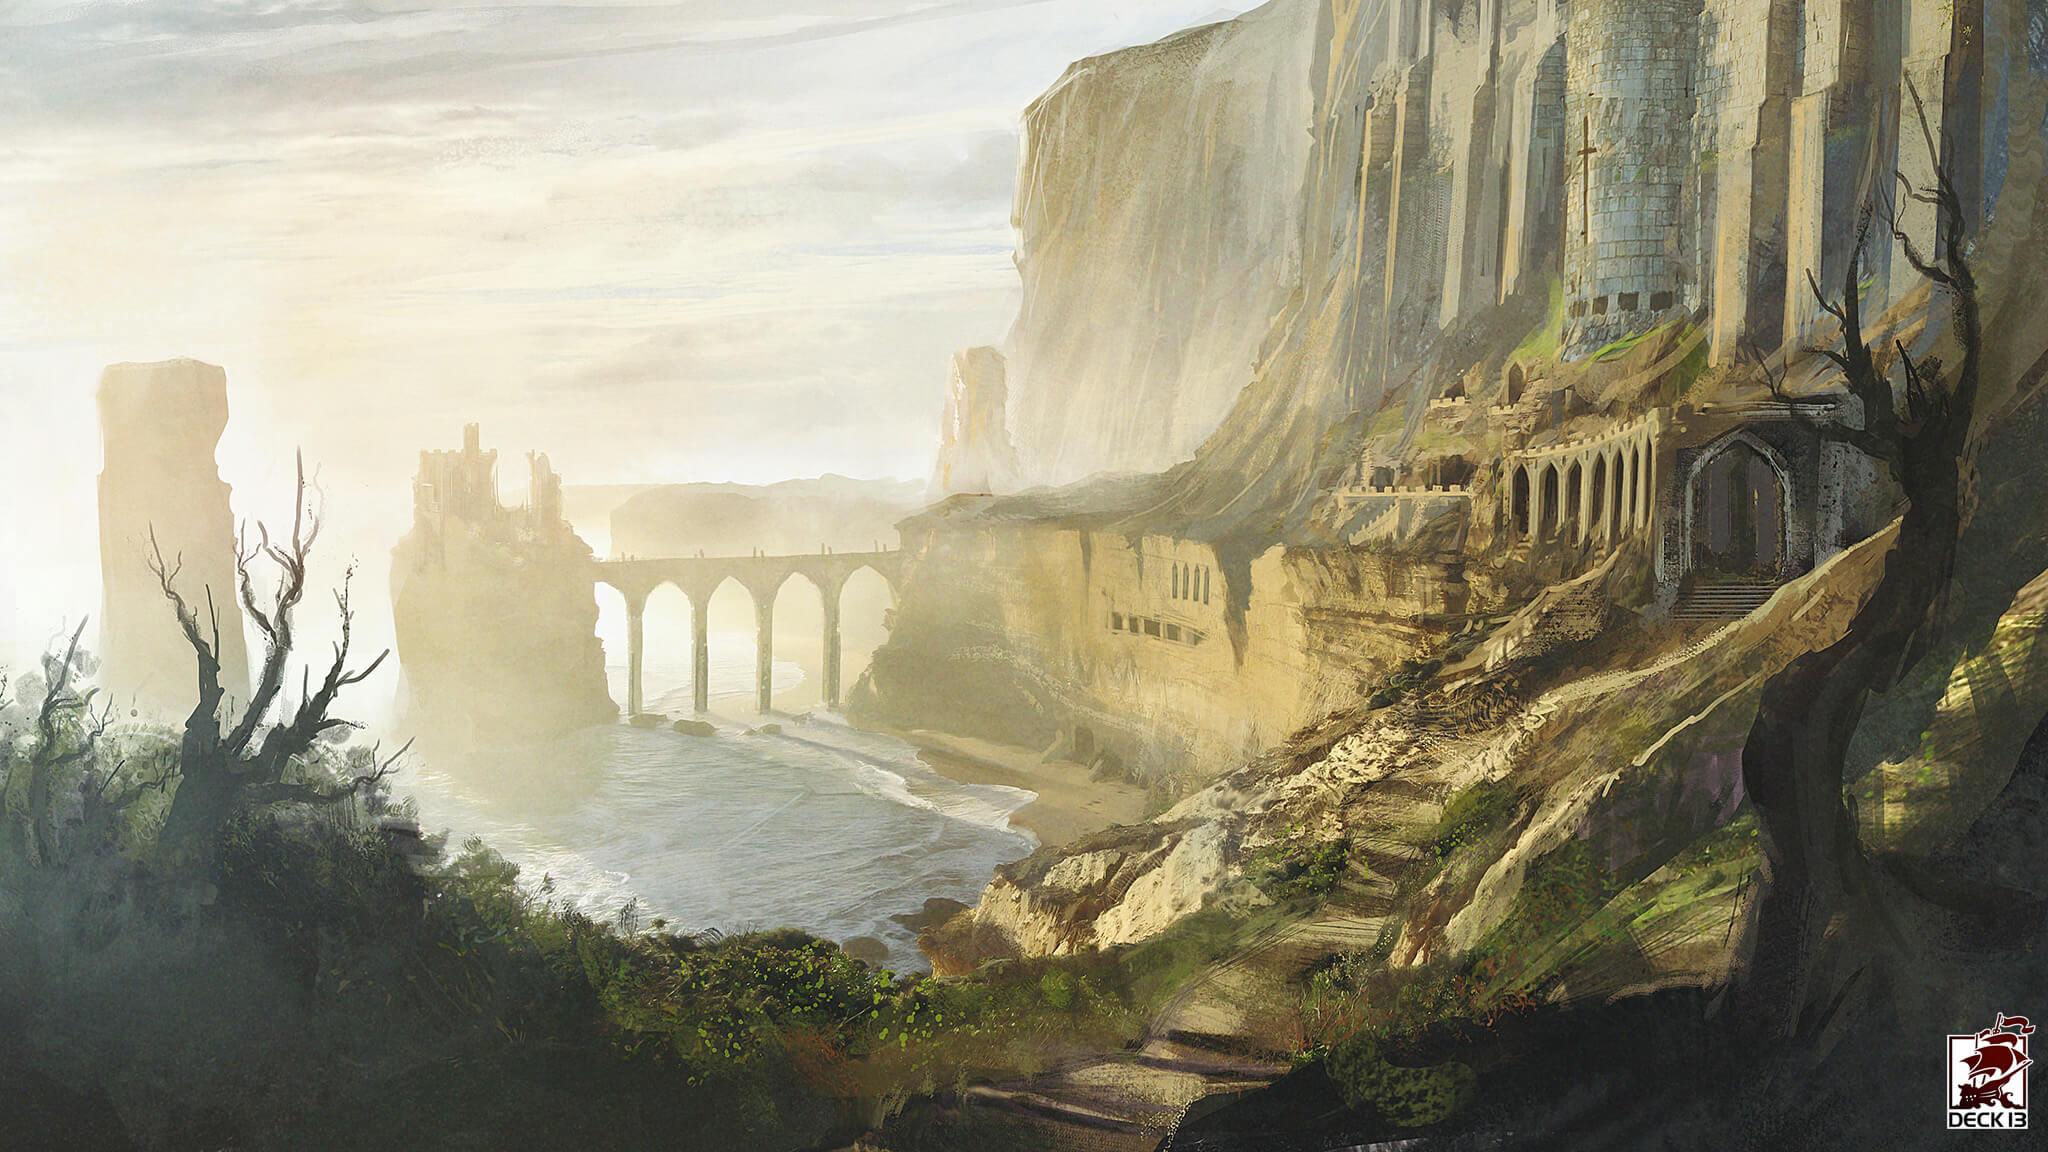 blood-knights-concept-art-felix-haas-cliff-mood-002